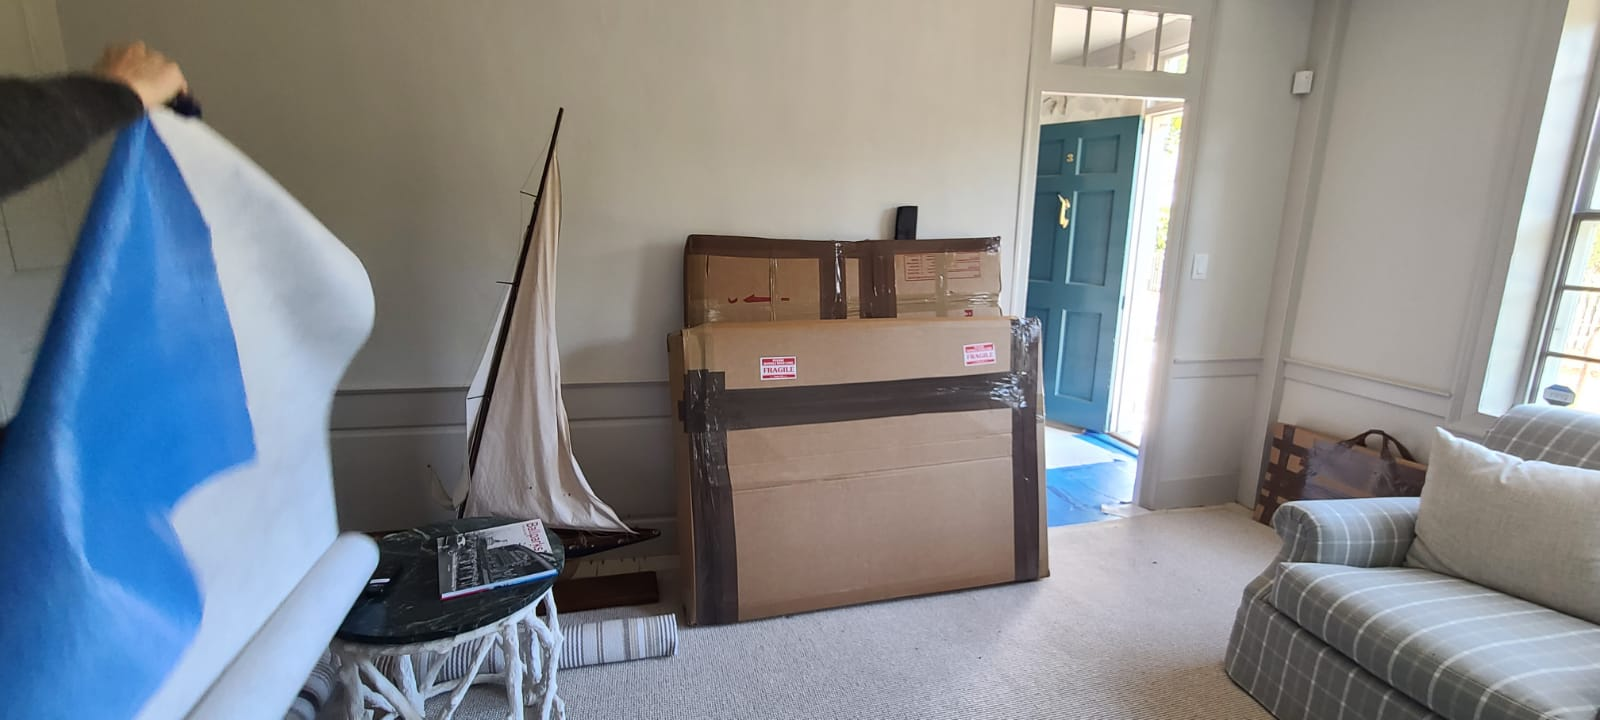 Fine Art Deliveries to Nantucket, Martha's Vineyard & Cape Cod